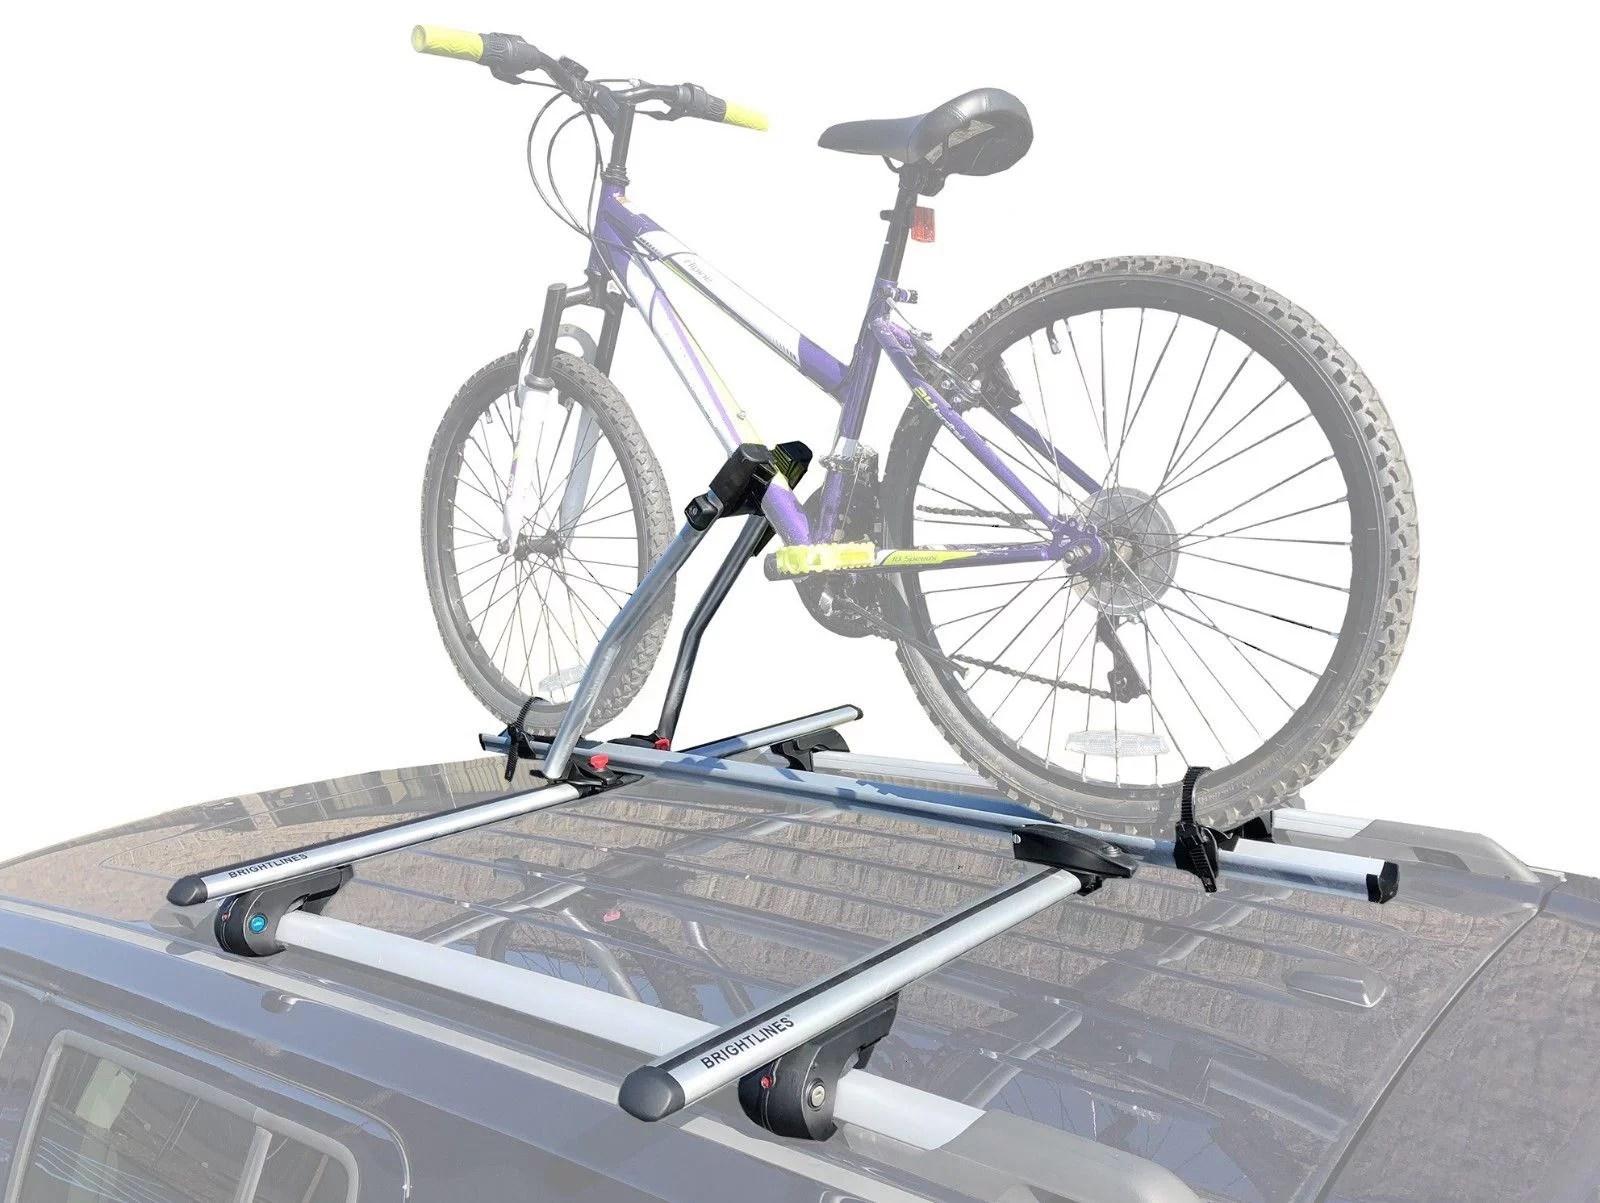 brightlines 2004 2015 lexus rx330 rx350 cross bars bike rack combo roof racks